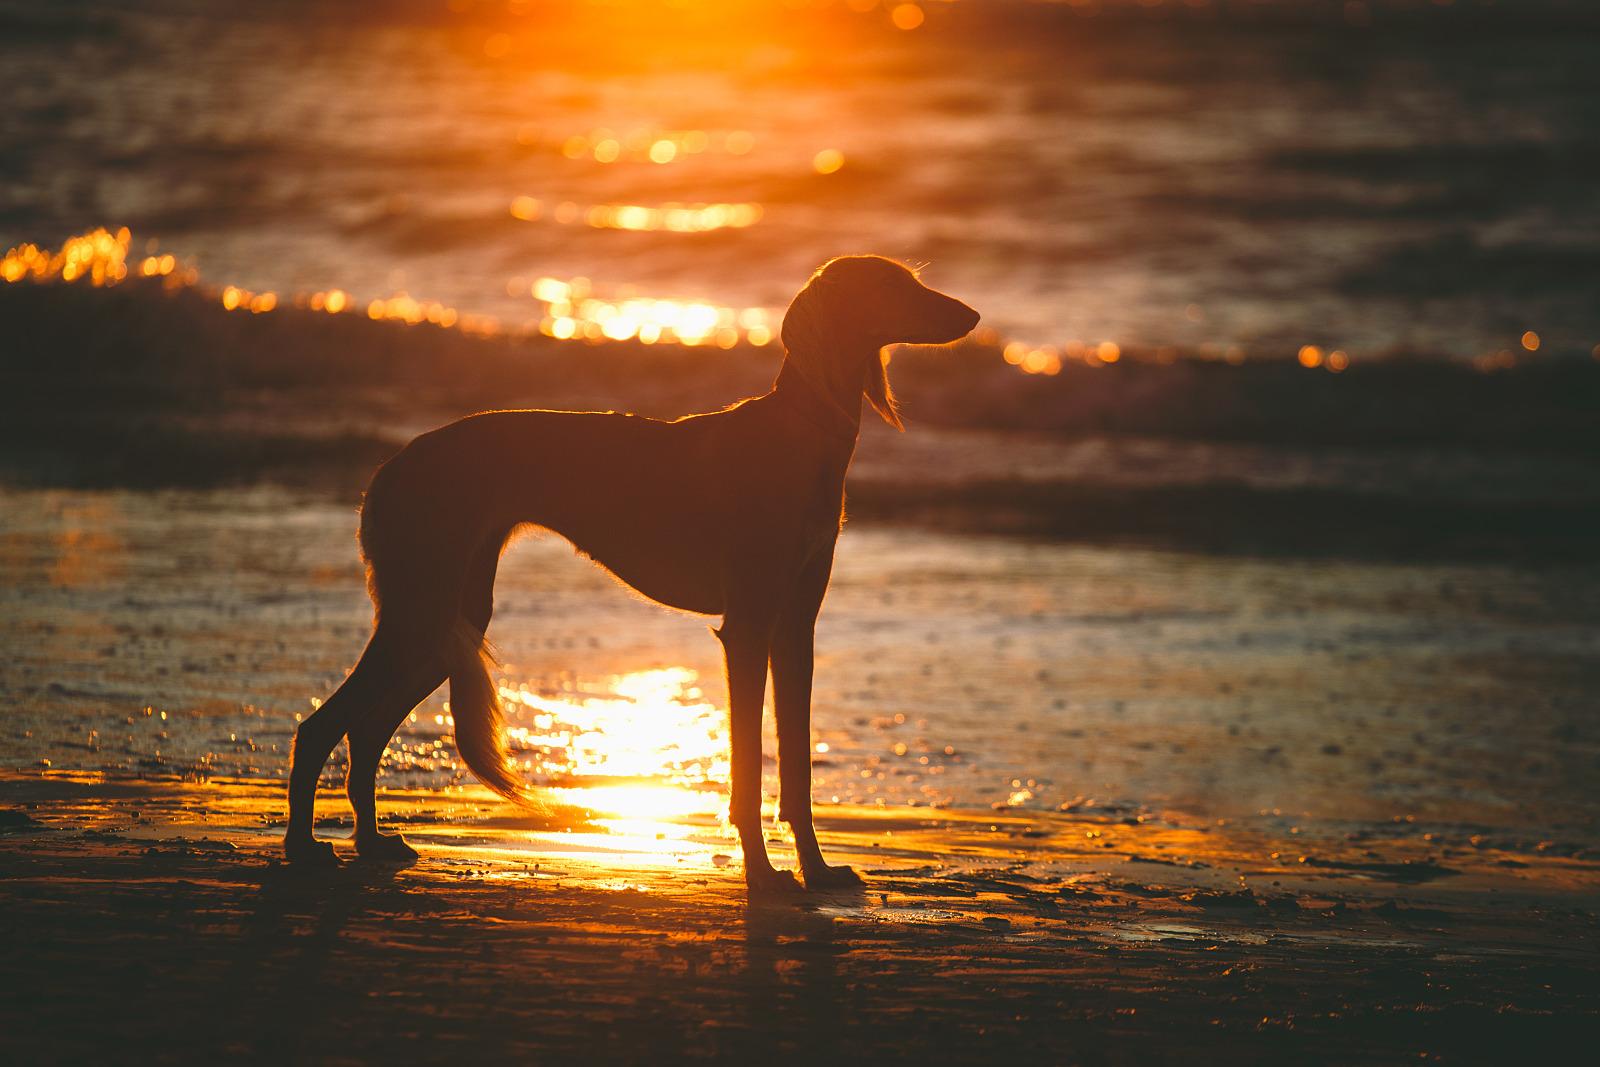 Tsirir the saluki at sunset